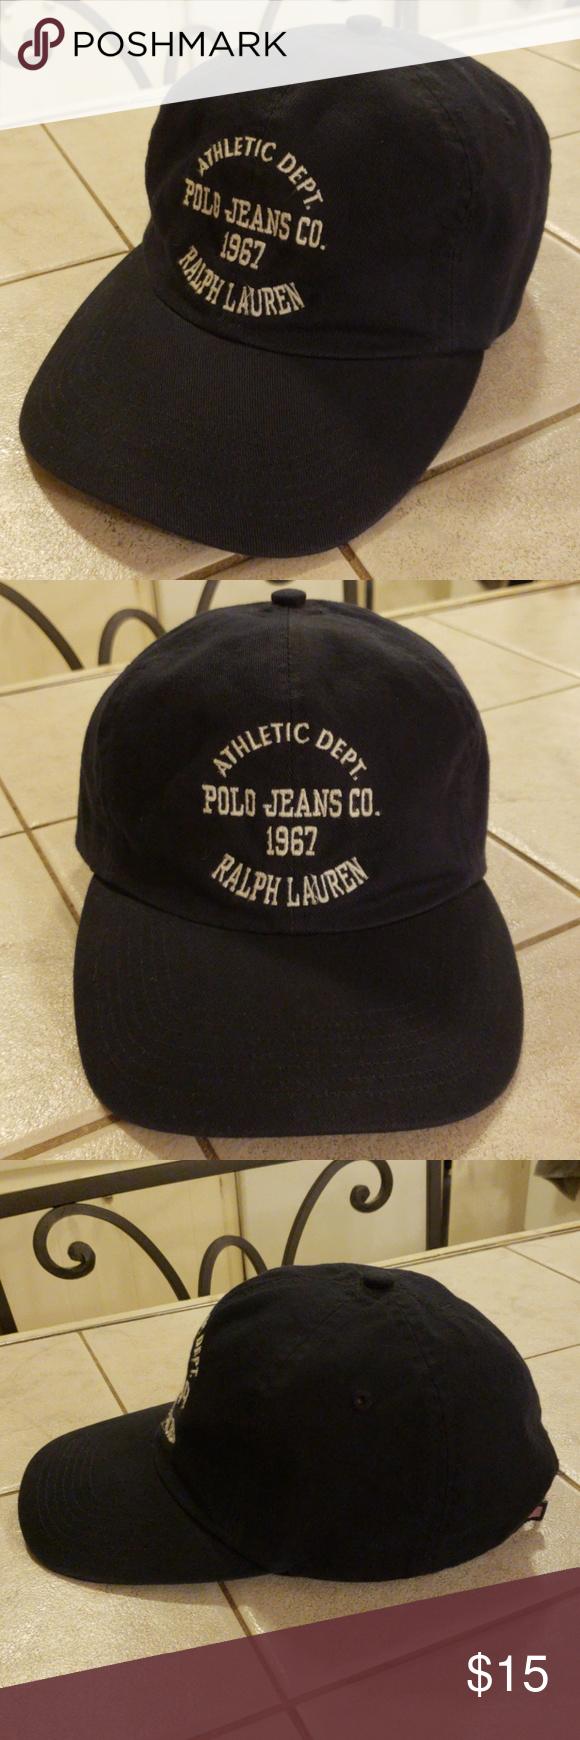 9f85214afe919 Polo Jean s Co. Ralph Lauren 1967 Adj. Hat Blue Athletic Dept. Polo Jeans